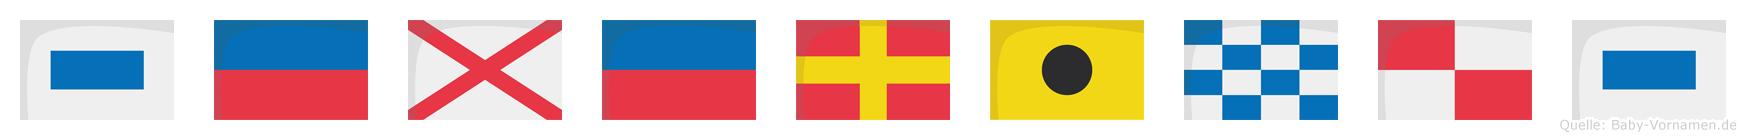 Severinus im Flaggenalphabet